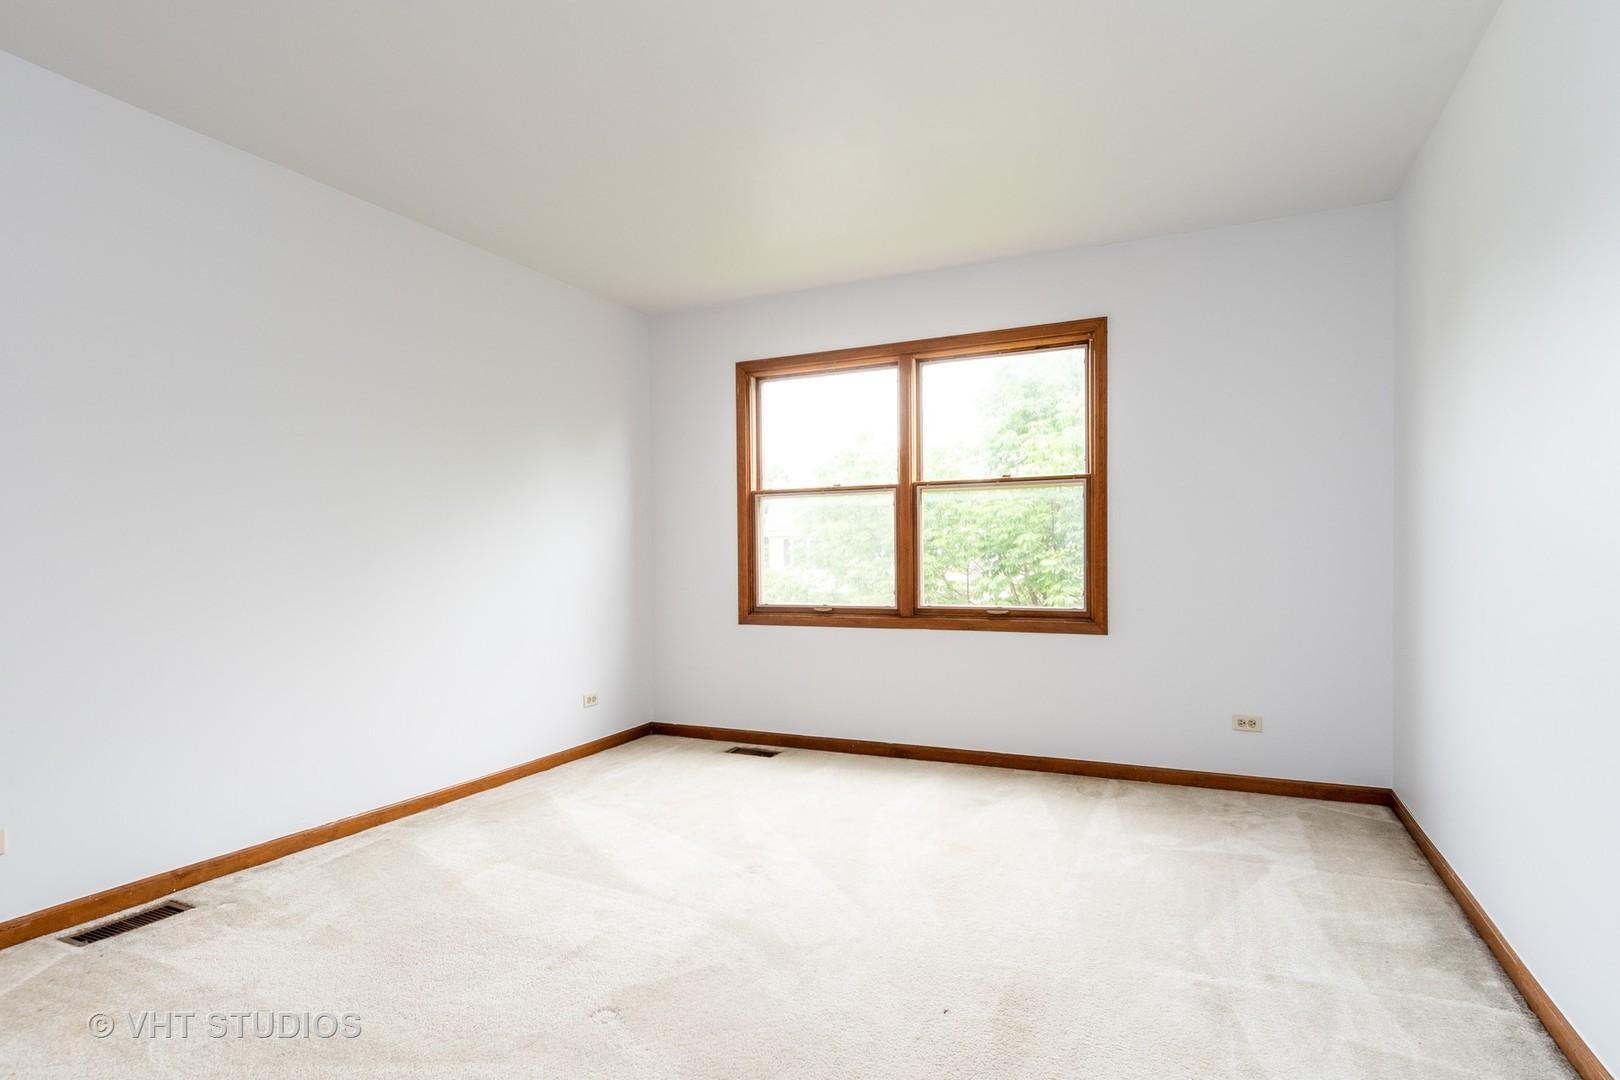 140 BRECKENRIDGE, AURORA, Illinois, 60504